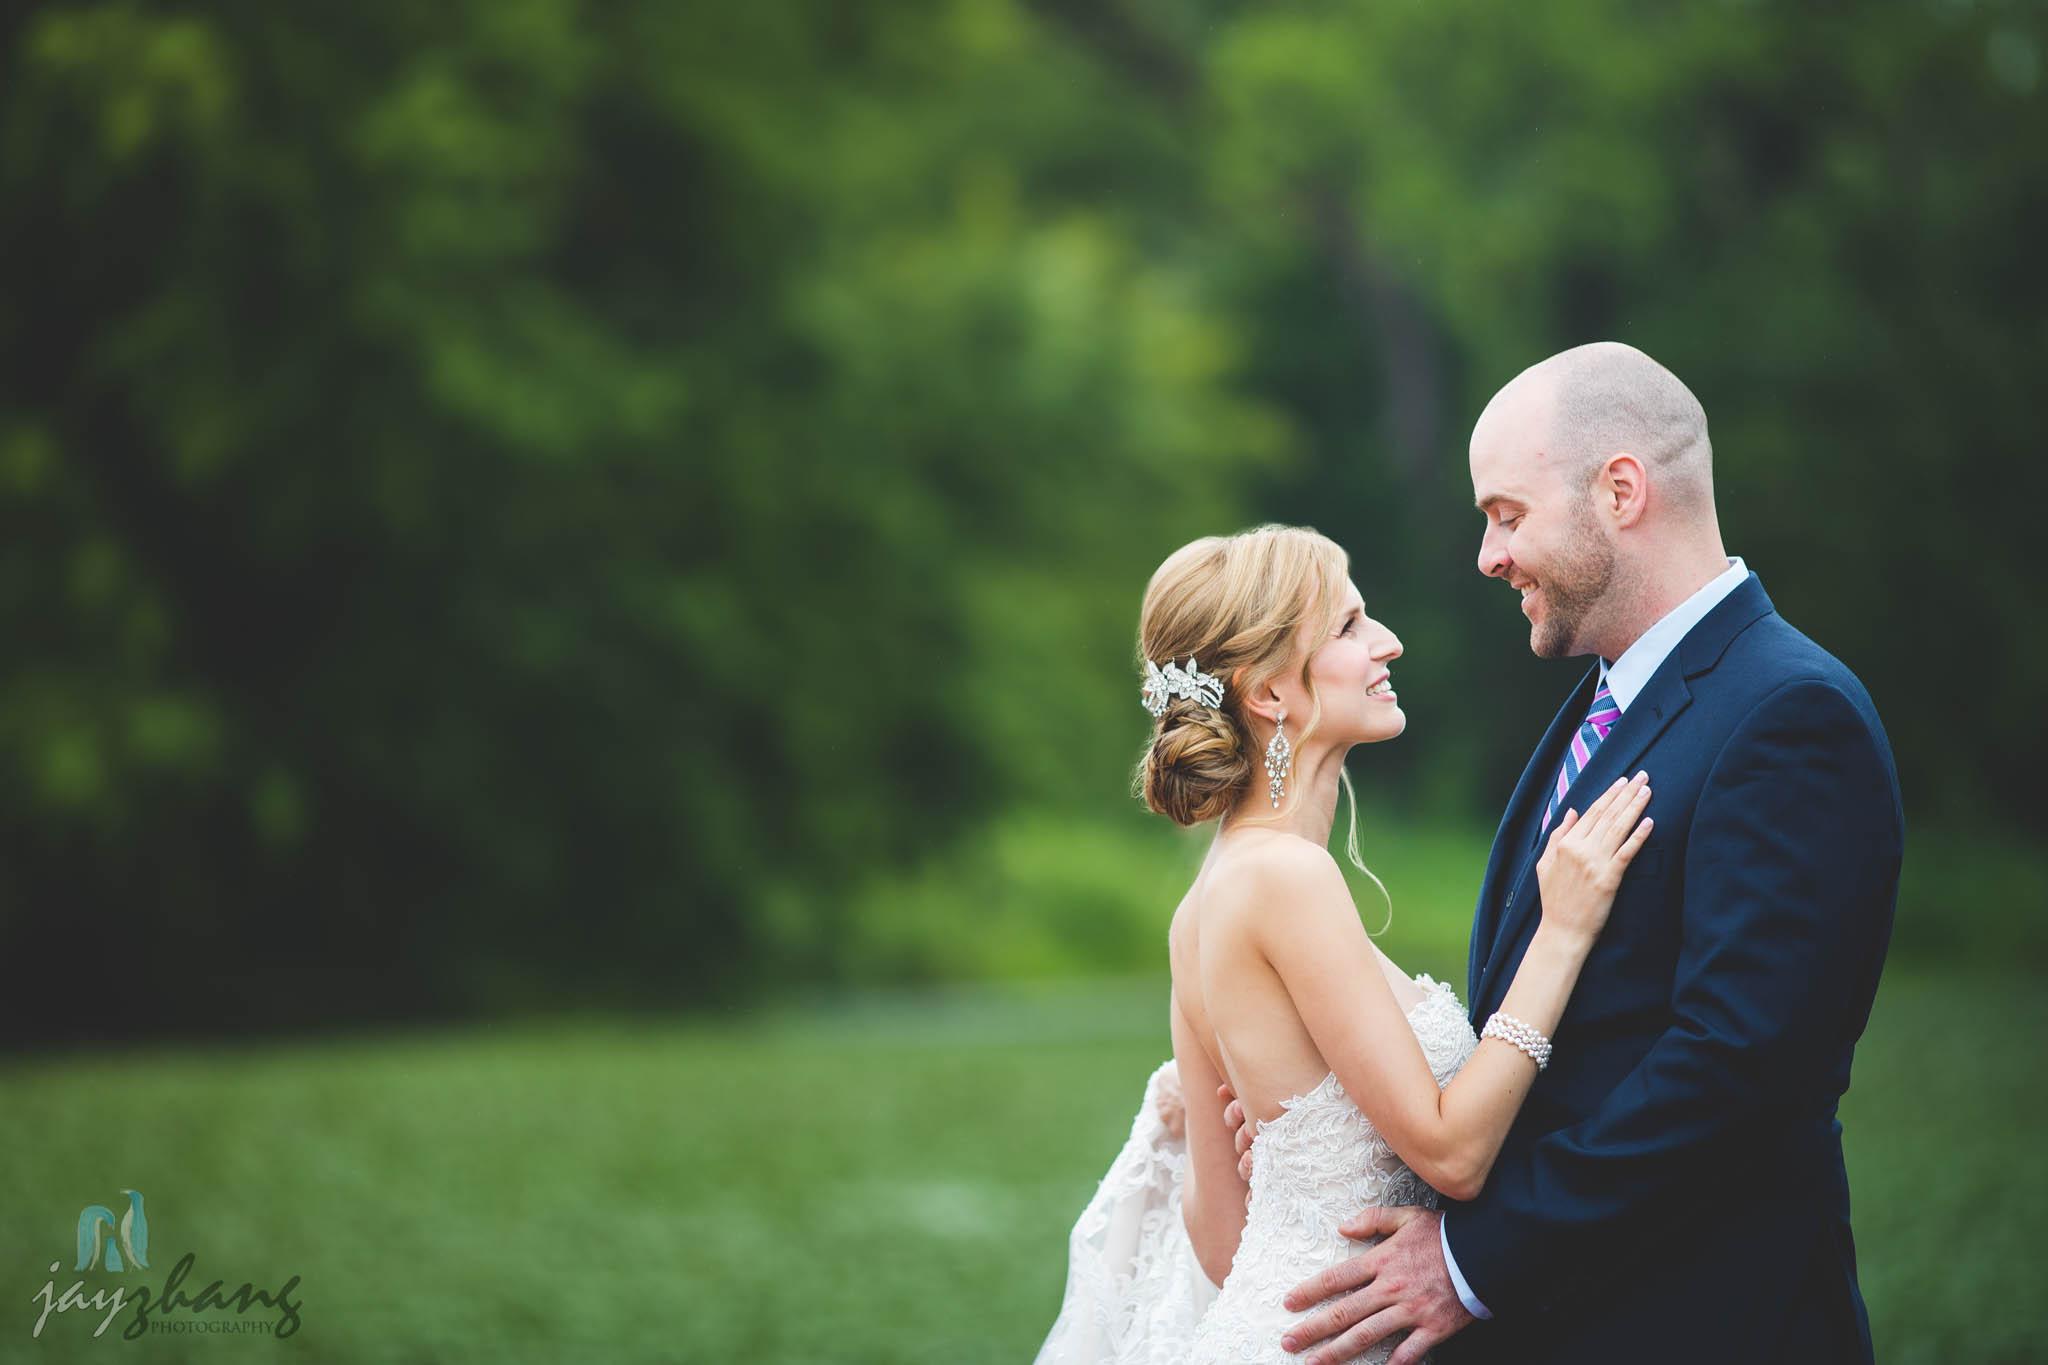 Albany_Wedding_Photographer-23.jpg